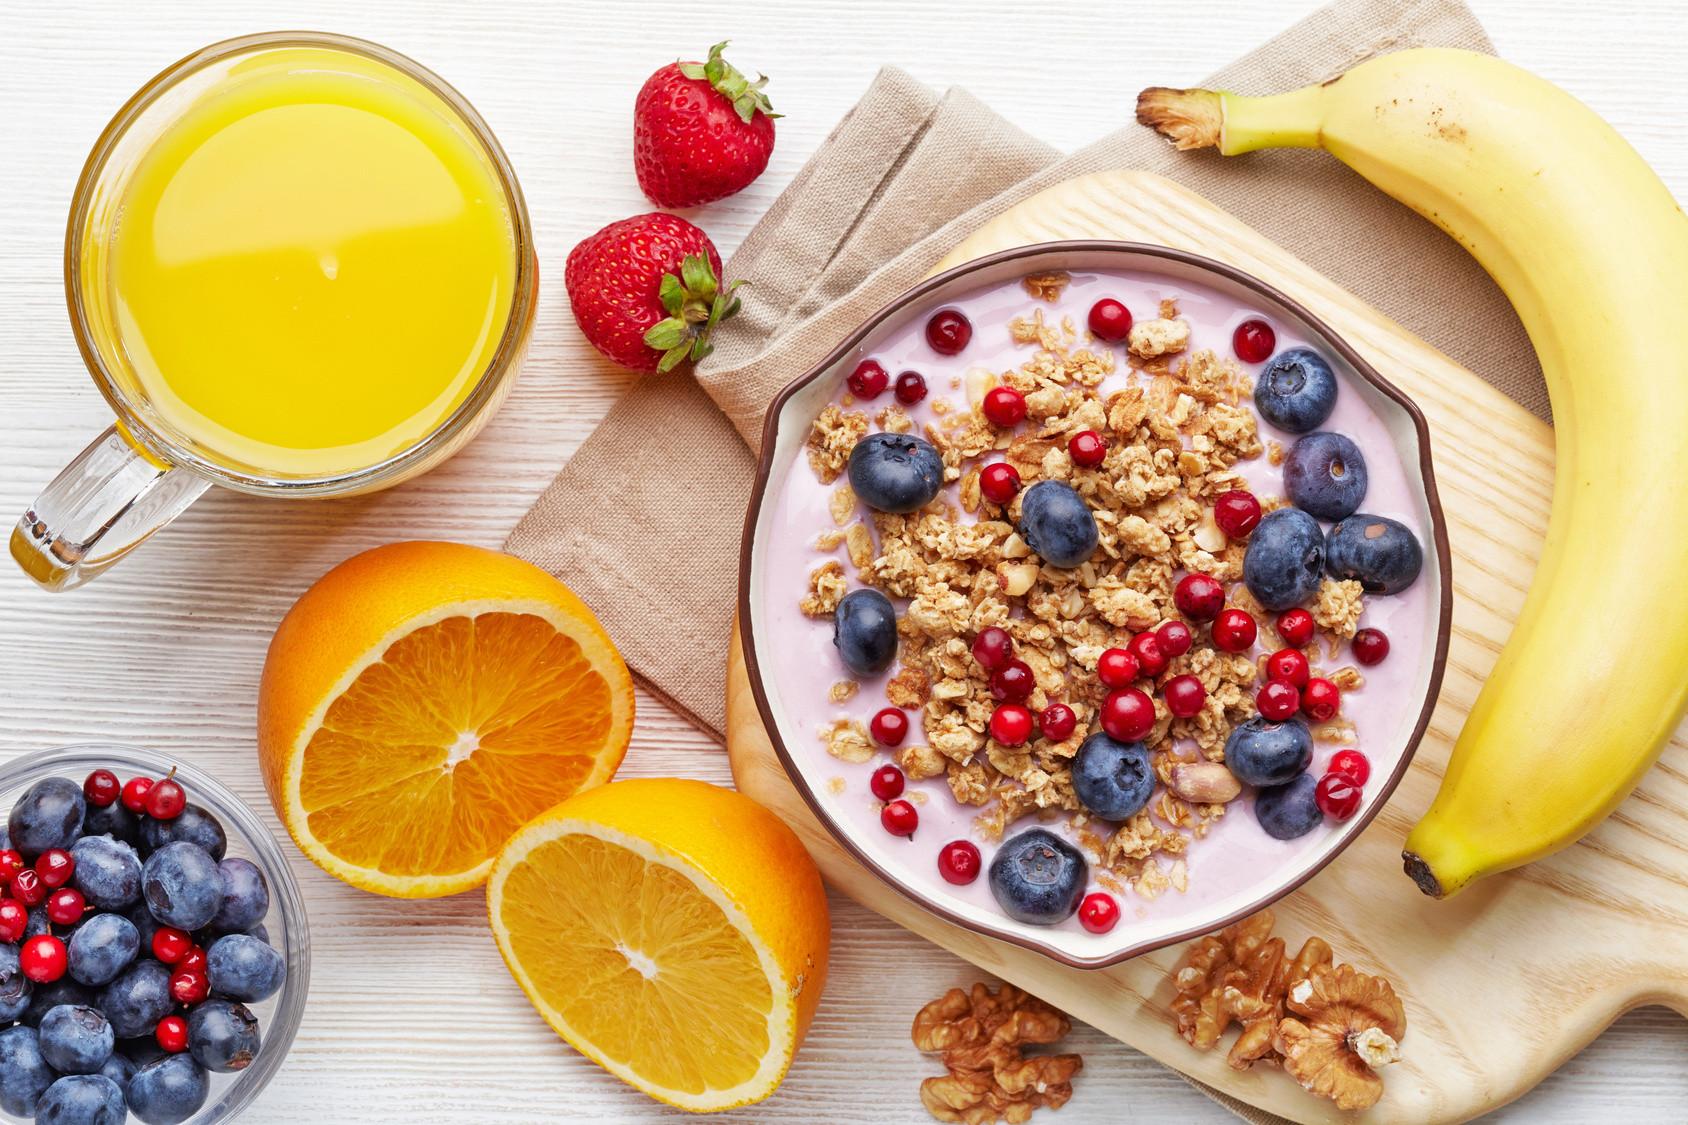 Simple Healthy Breakfast  Easy And Healthy Breakfast Ideas